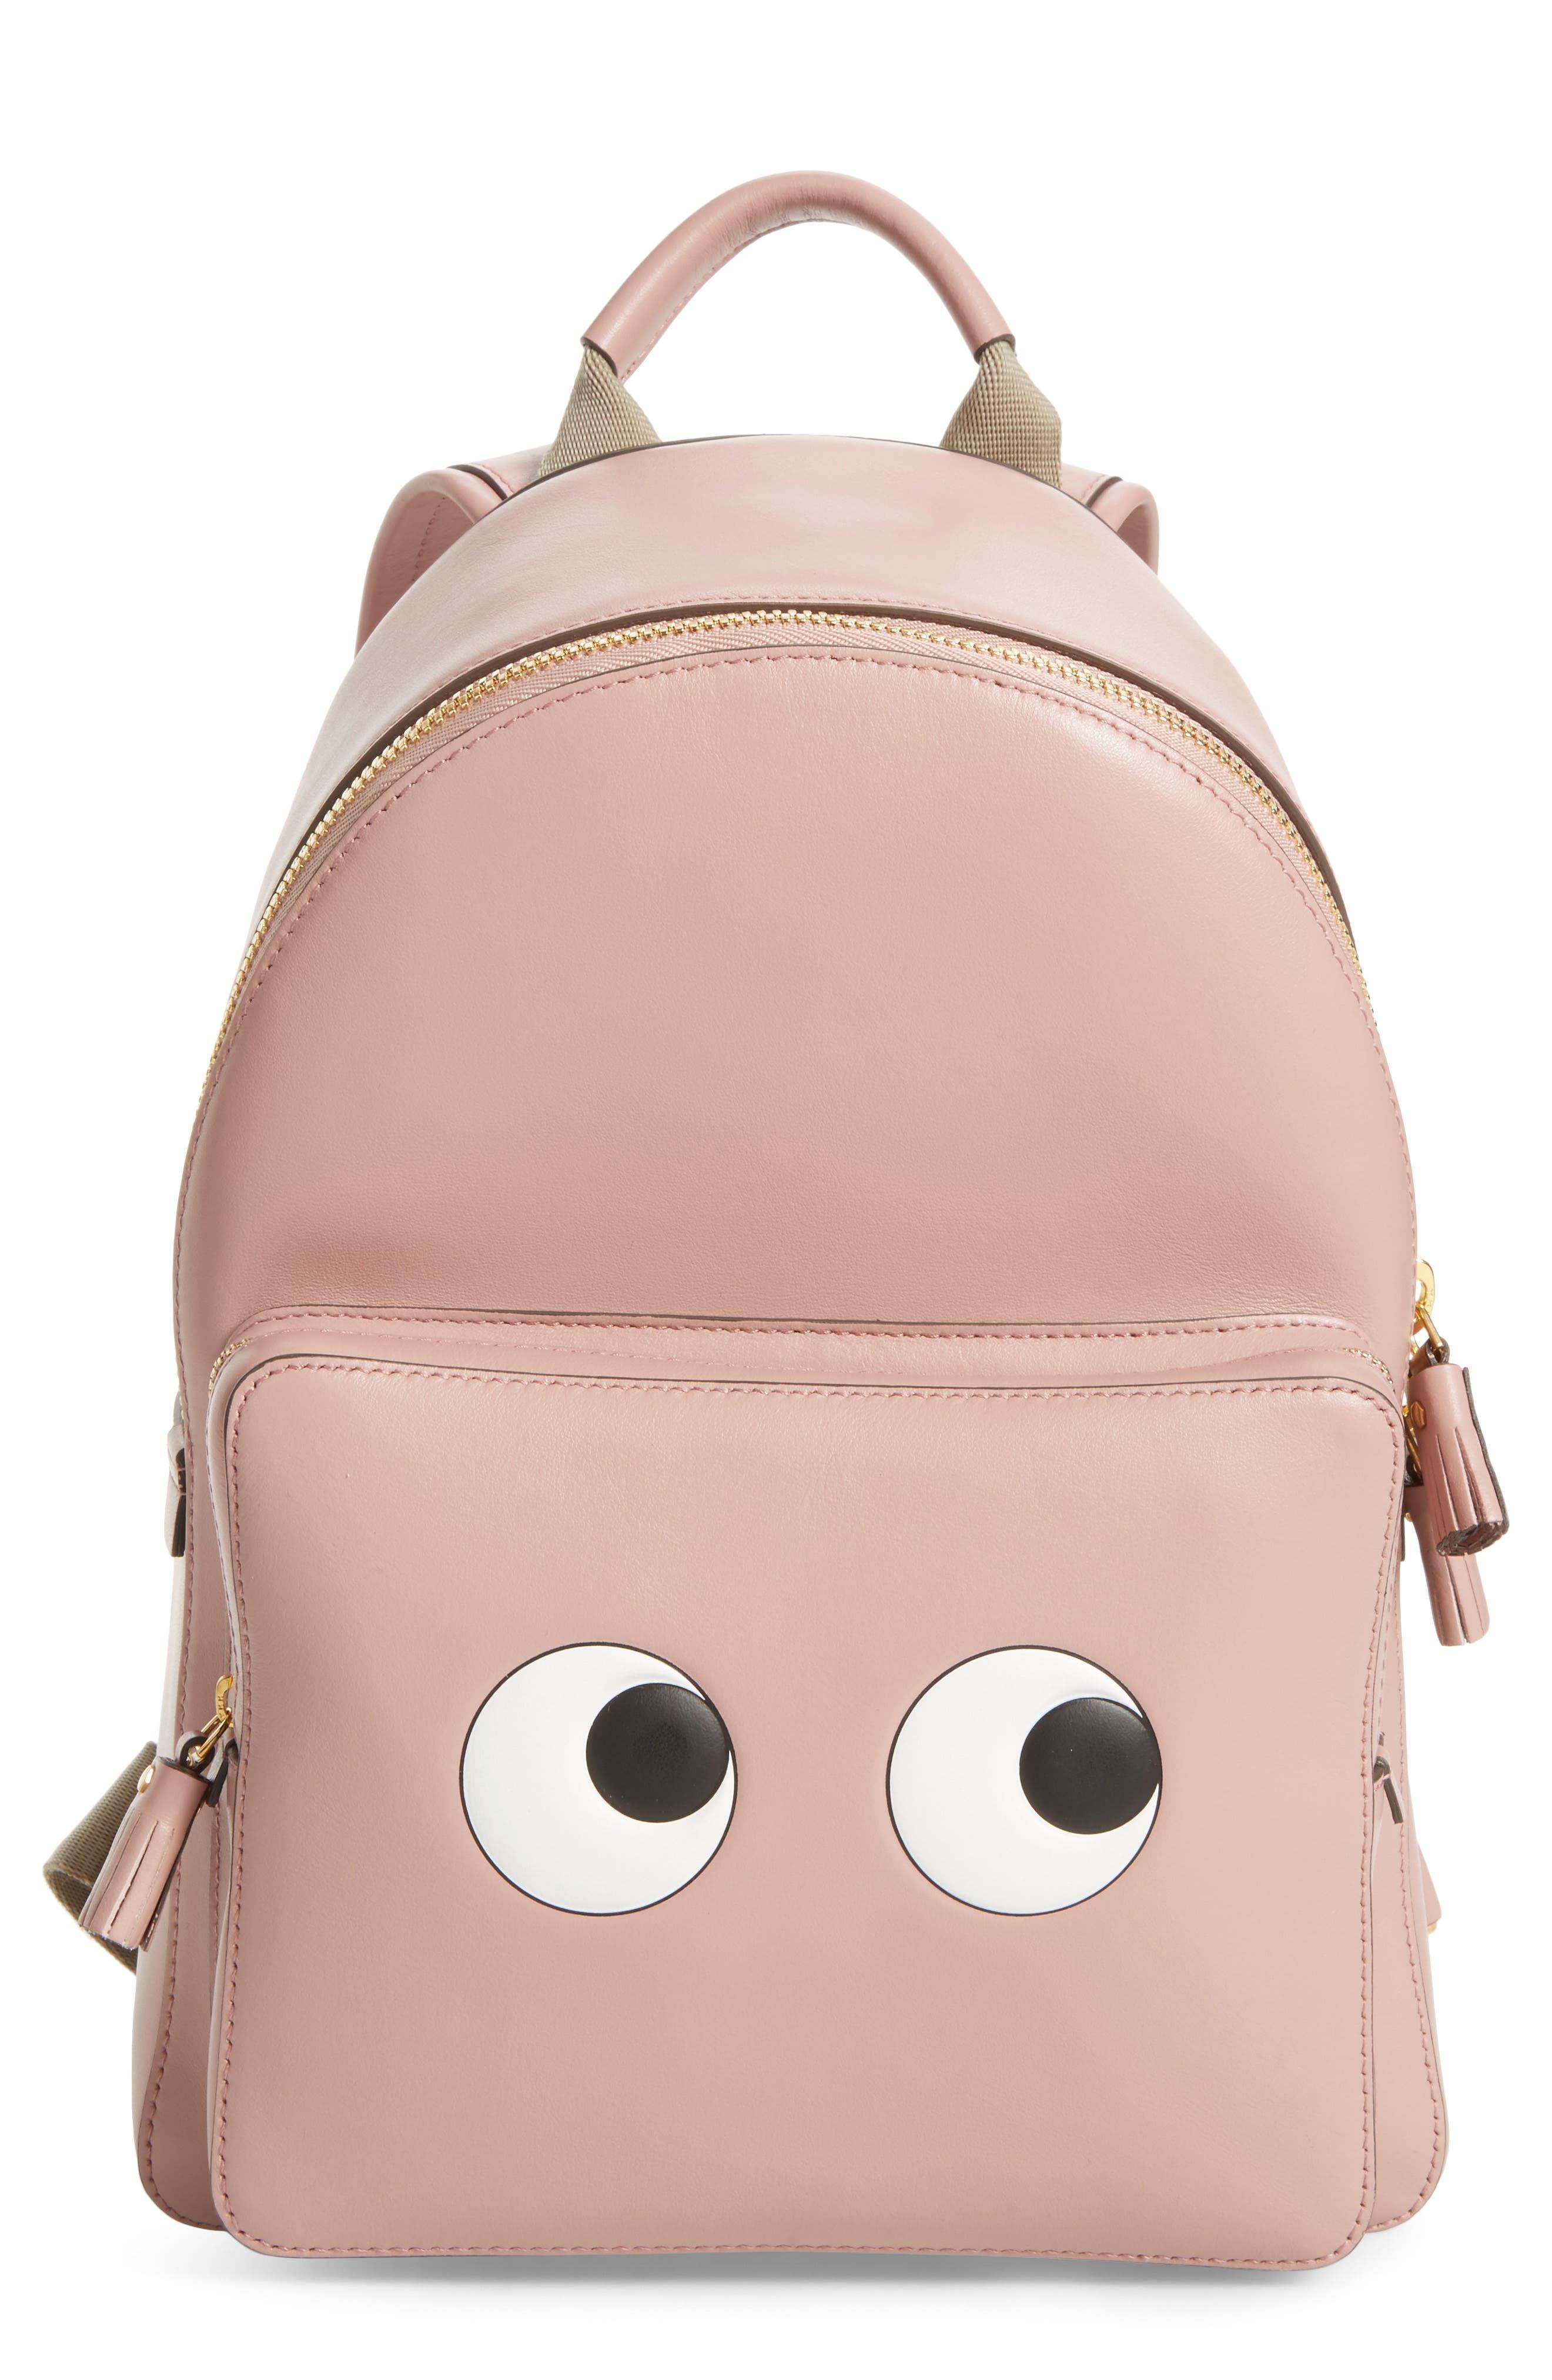 ANYA HINDMARCH,                             Eyes Mini Leather Backpack,                             Main thumbnail 1, color,                             650